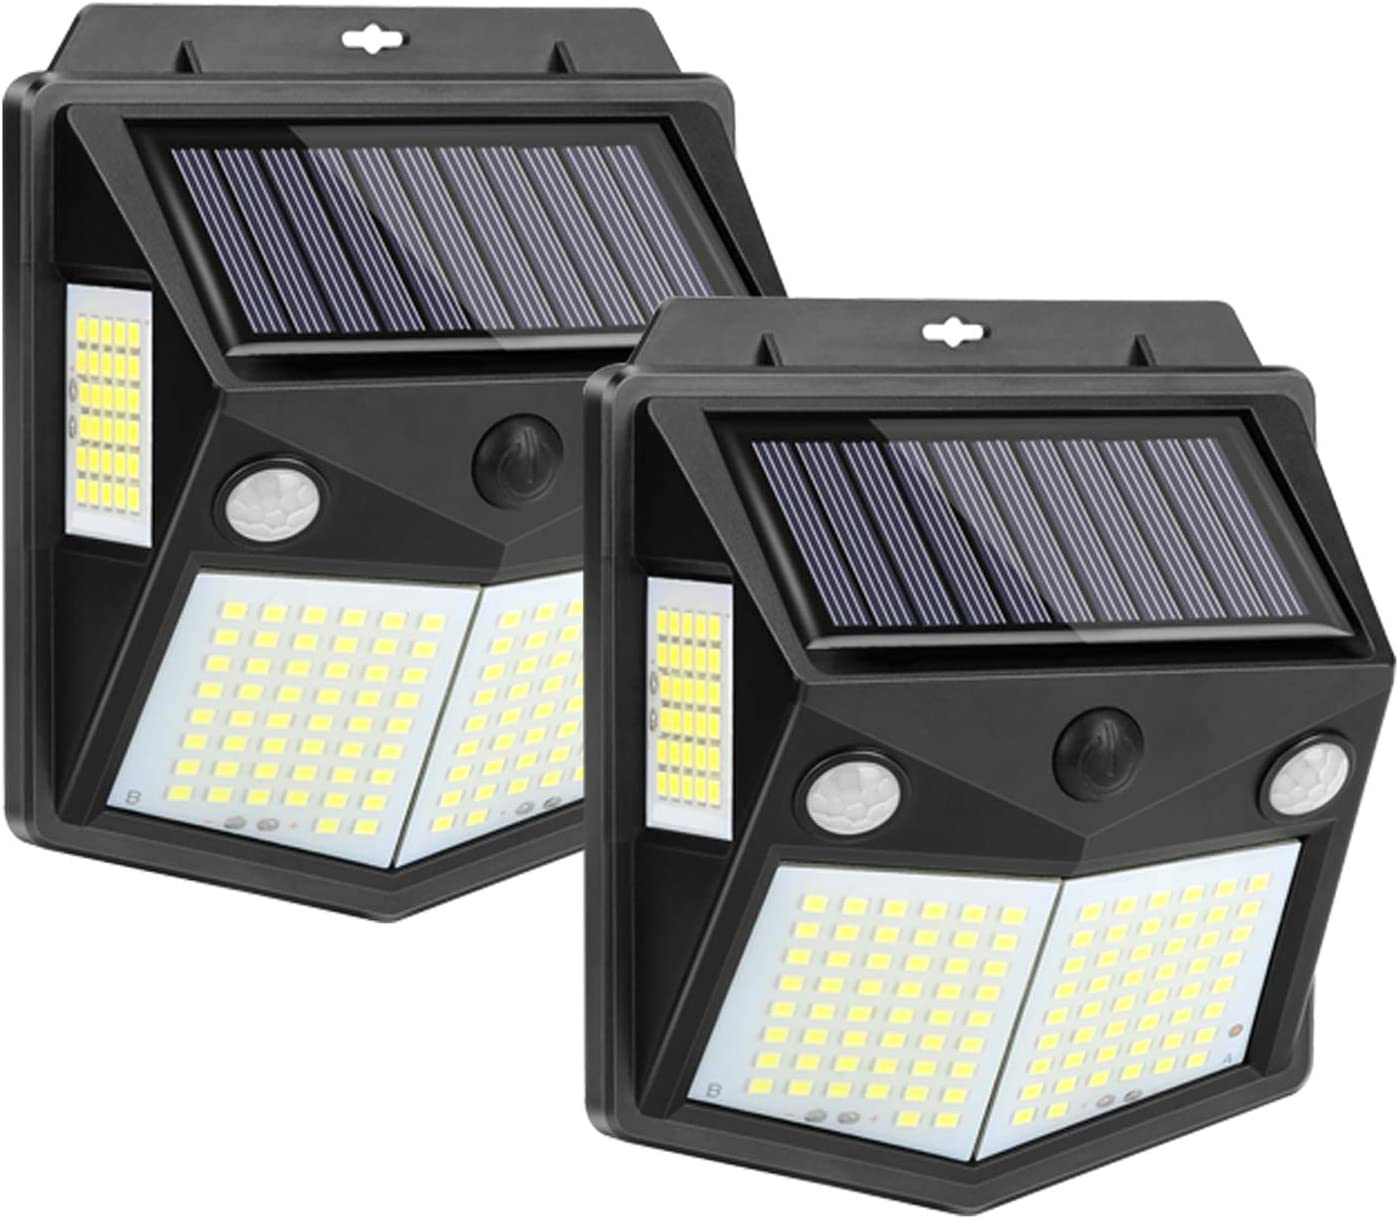 Amazon Com Kaulsoue 160 Led Solar Motion Sensor Light Outdoor 2 Sensor Outside Waterproof Solar Powered Security Wall Lights For Yard Garden Deck Patio 2 Pack Home Improvement